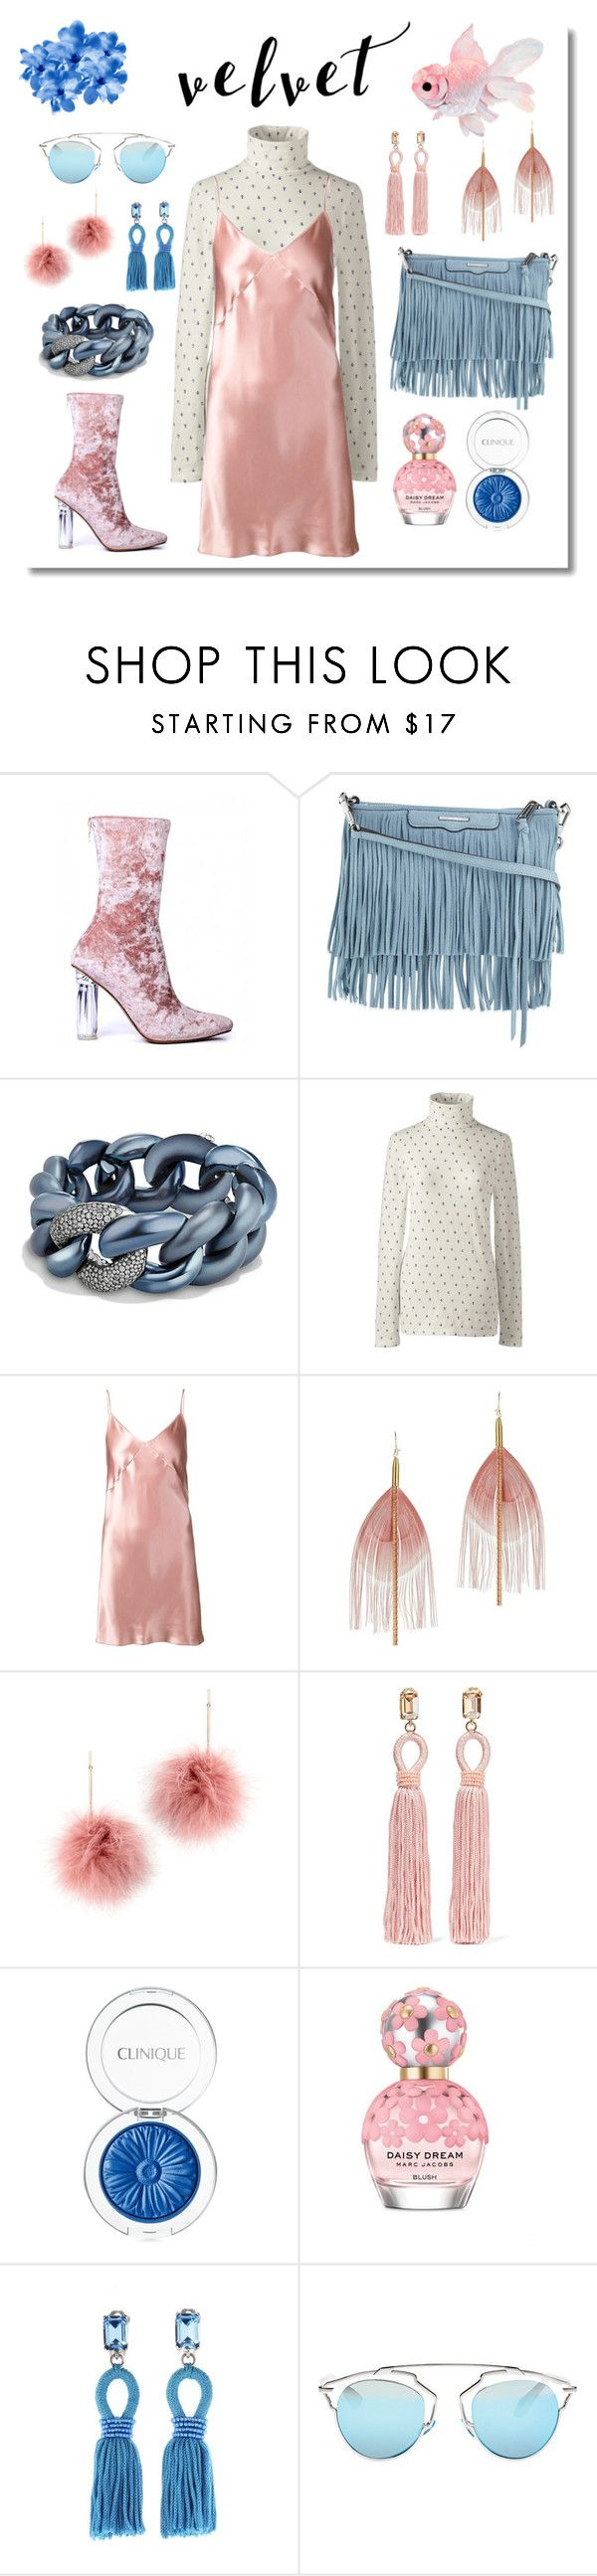 """Velvet rose"" by dilka-ylibka on Polyvore featuring мода, Rebecca Minkoff, David Yurman, Lands' End, Fleur du Mal, Serefina, Tuleste, Oscar de la Renta, Clinique и Marc Jacobs"